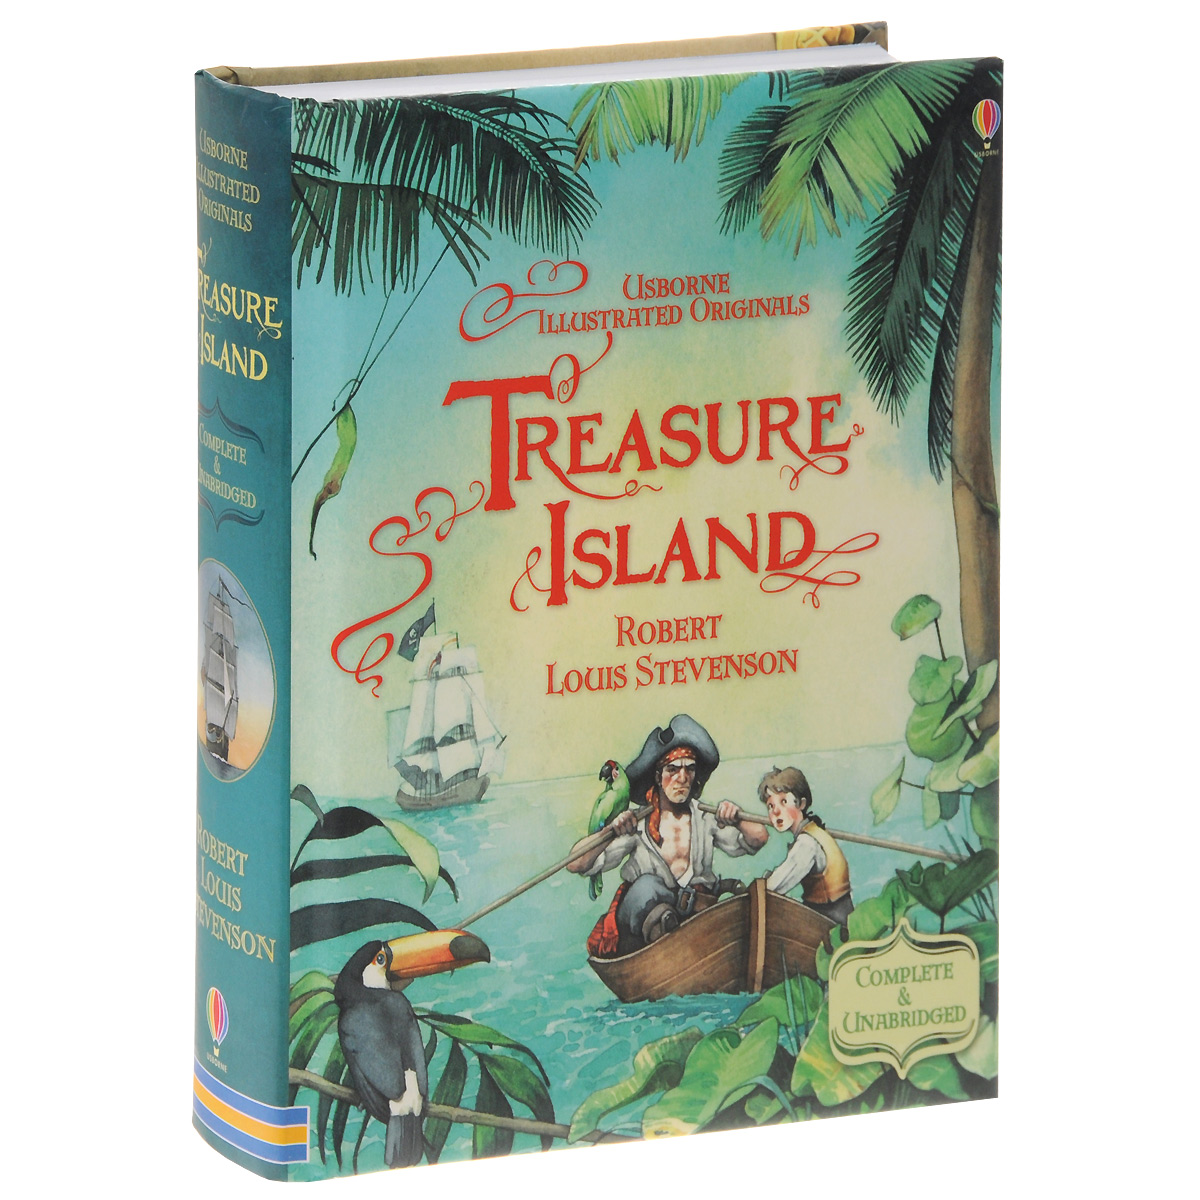 Treasure Island addison cooke and the treasure of the incas